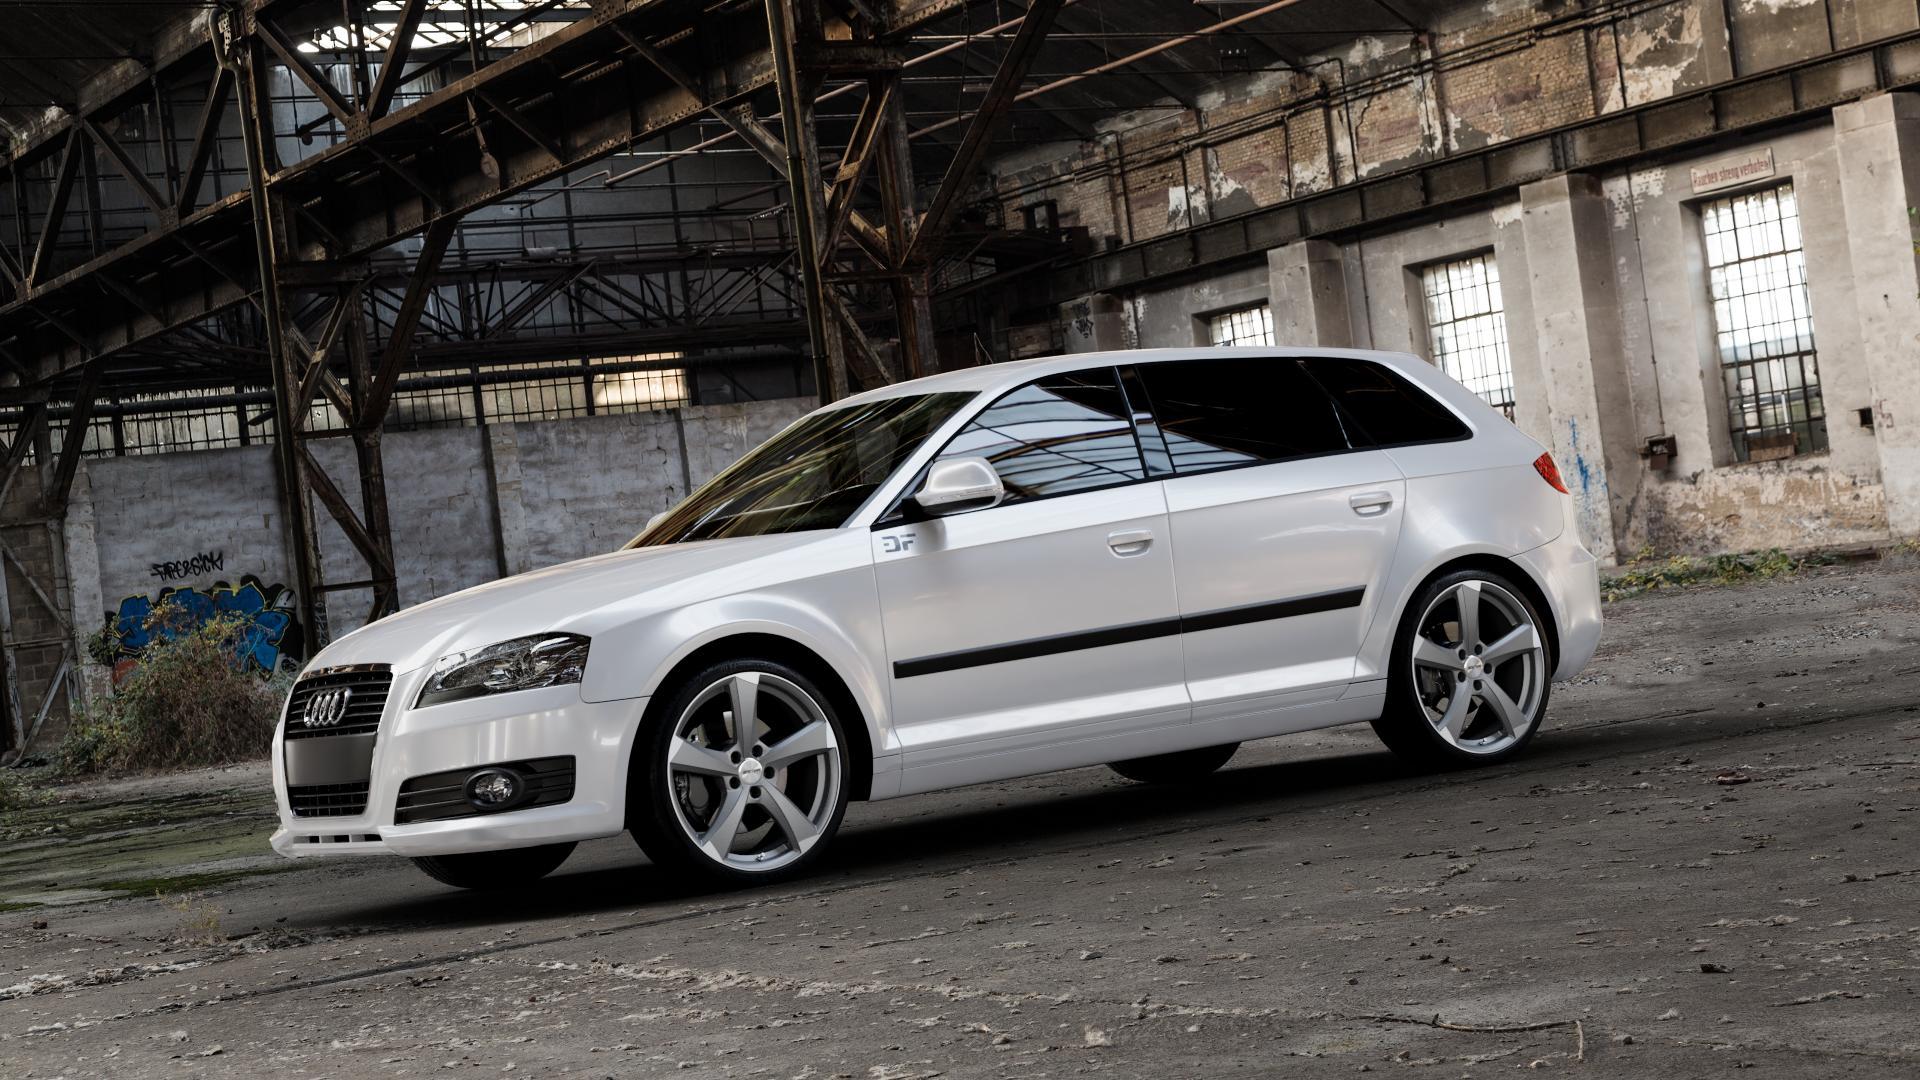 GMP Italia Ican Anthr. matt diamond Felge mit Reifen grau anthrazit in 19Zoll Winterfelge Alufelge auf weissem Audi A3 Typ 8P (Sportback) 1,6l 75kW (102 PS) 2,0l FSI 110kW (150 1,9l TDI 77kW (105 103kW (140 TFSI 147kW (200 85kW (116 100kW (136 1,8l 118kW (160 125kW (170 1,4l 92kW (125 120kW (163 quattro 3,2l V6 184kW (250 S3 195kW (265 1,2l 66kW (90 18